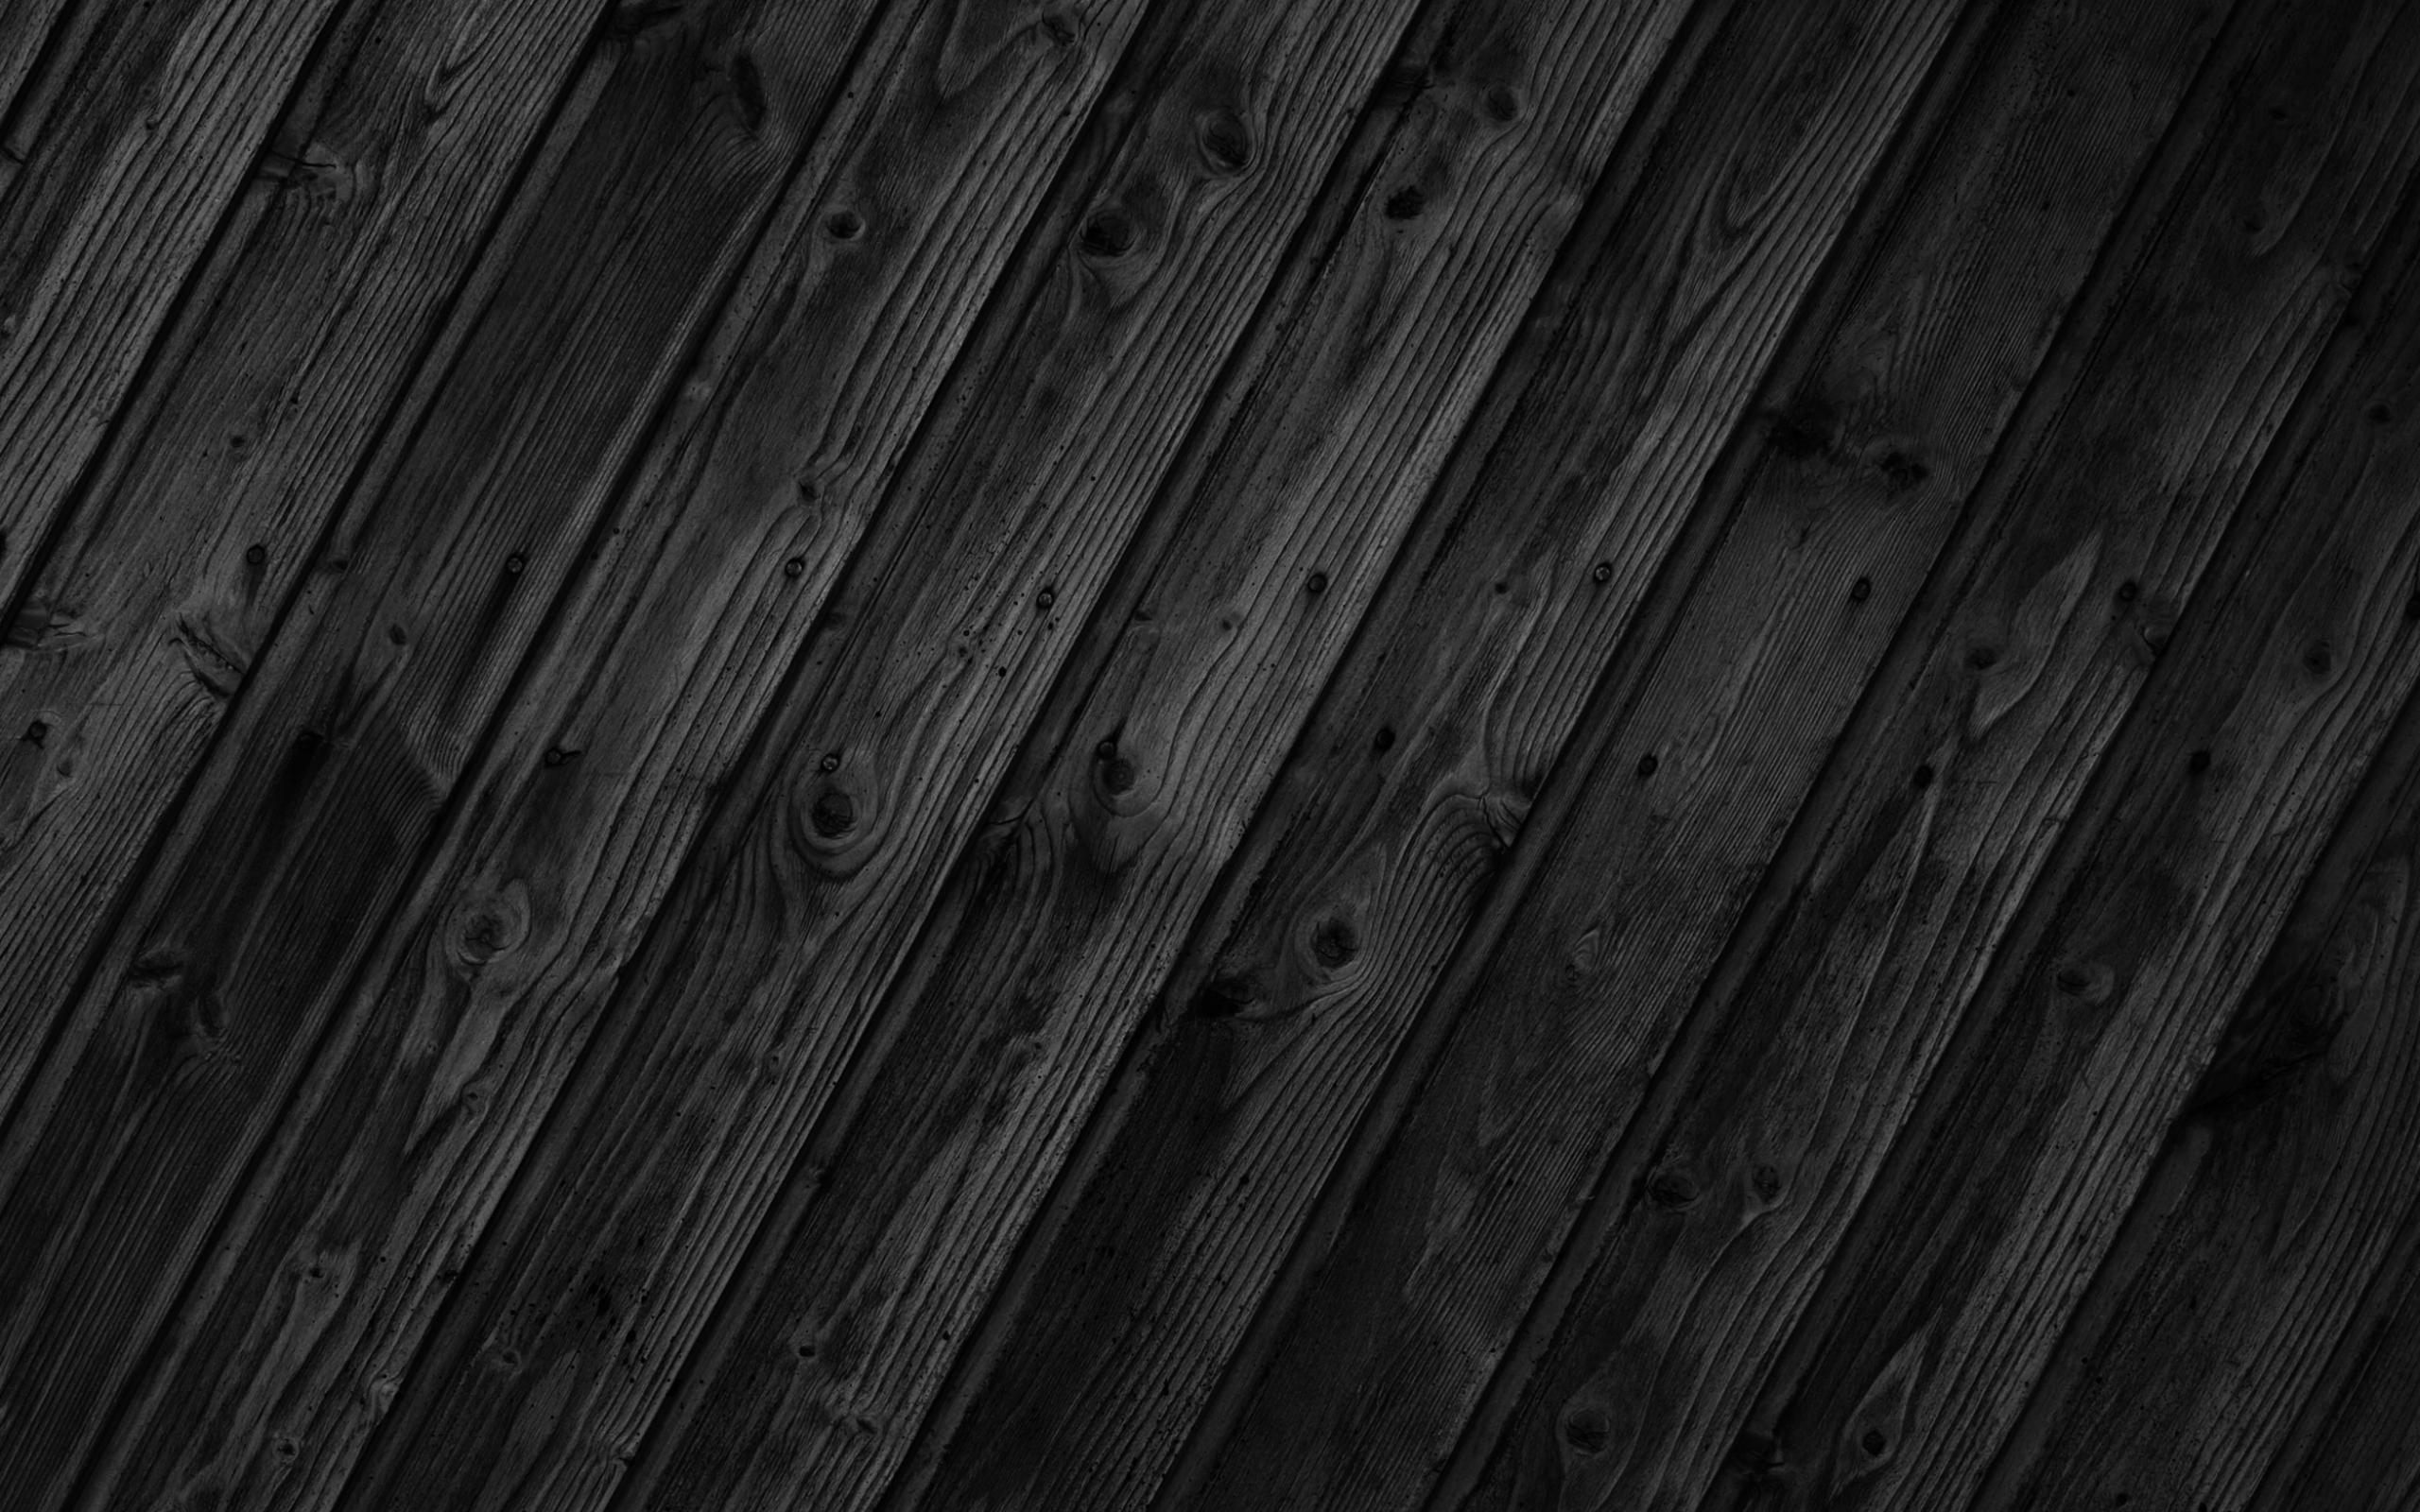 Black Wood Patterns Textures Wallpaper HD Wallpaper 2560x1600